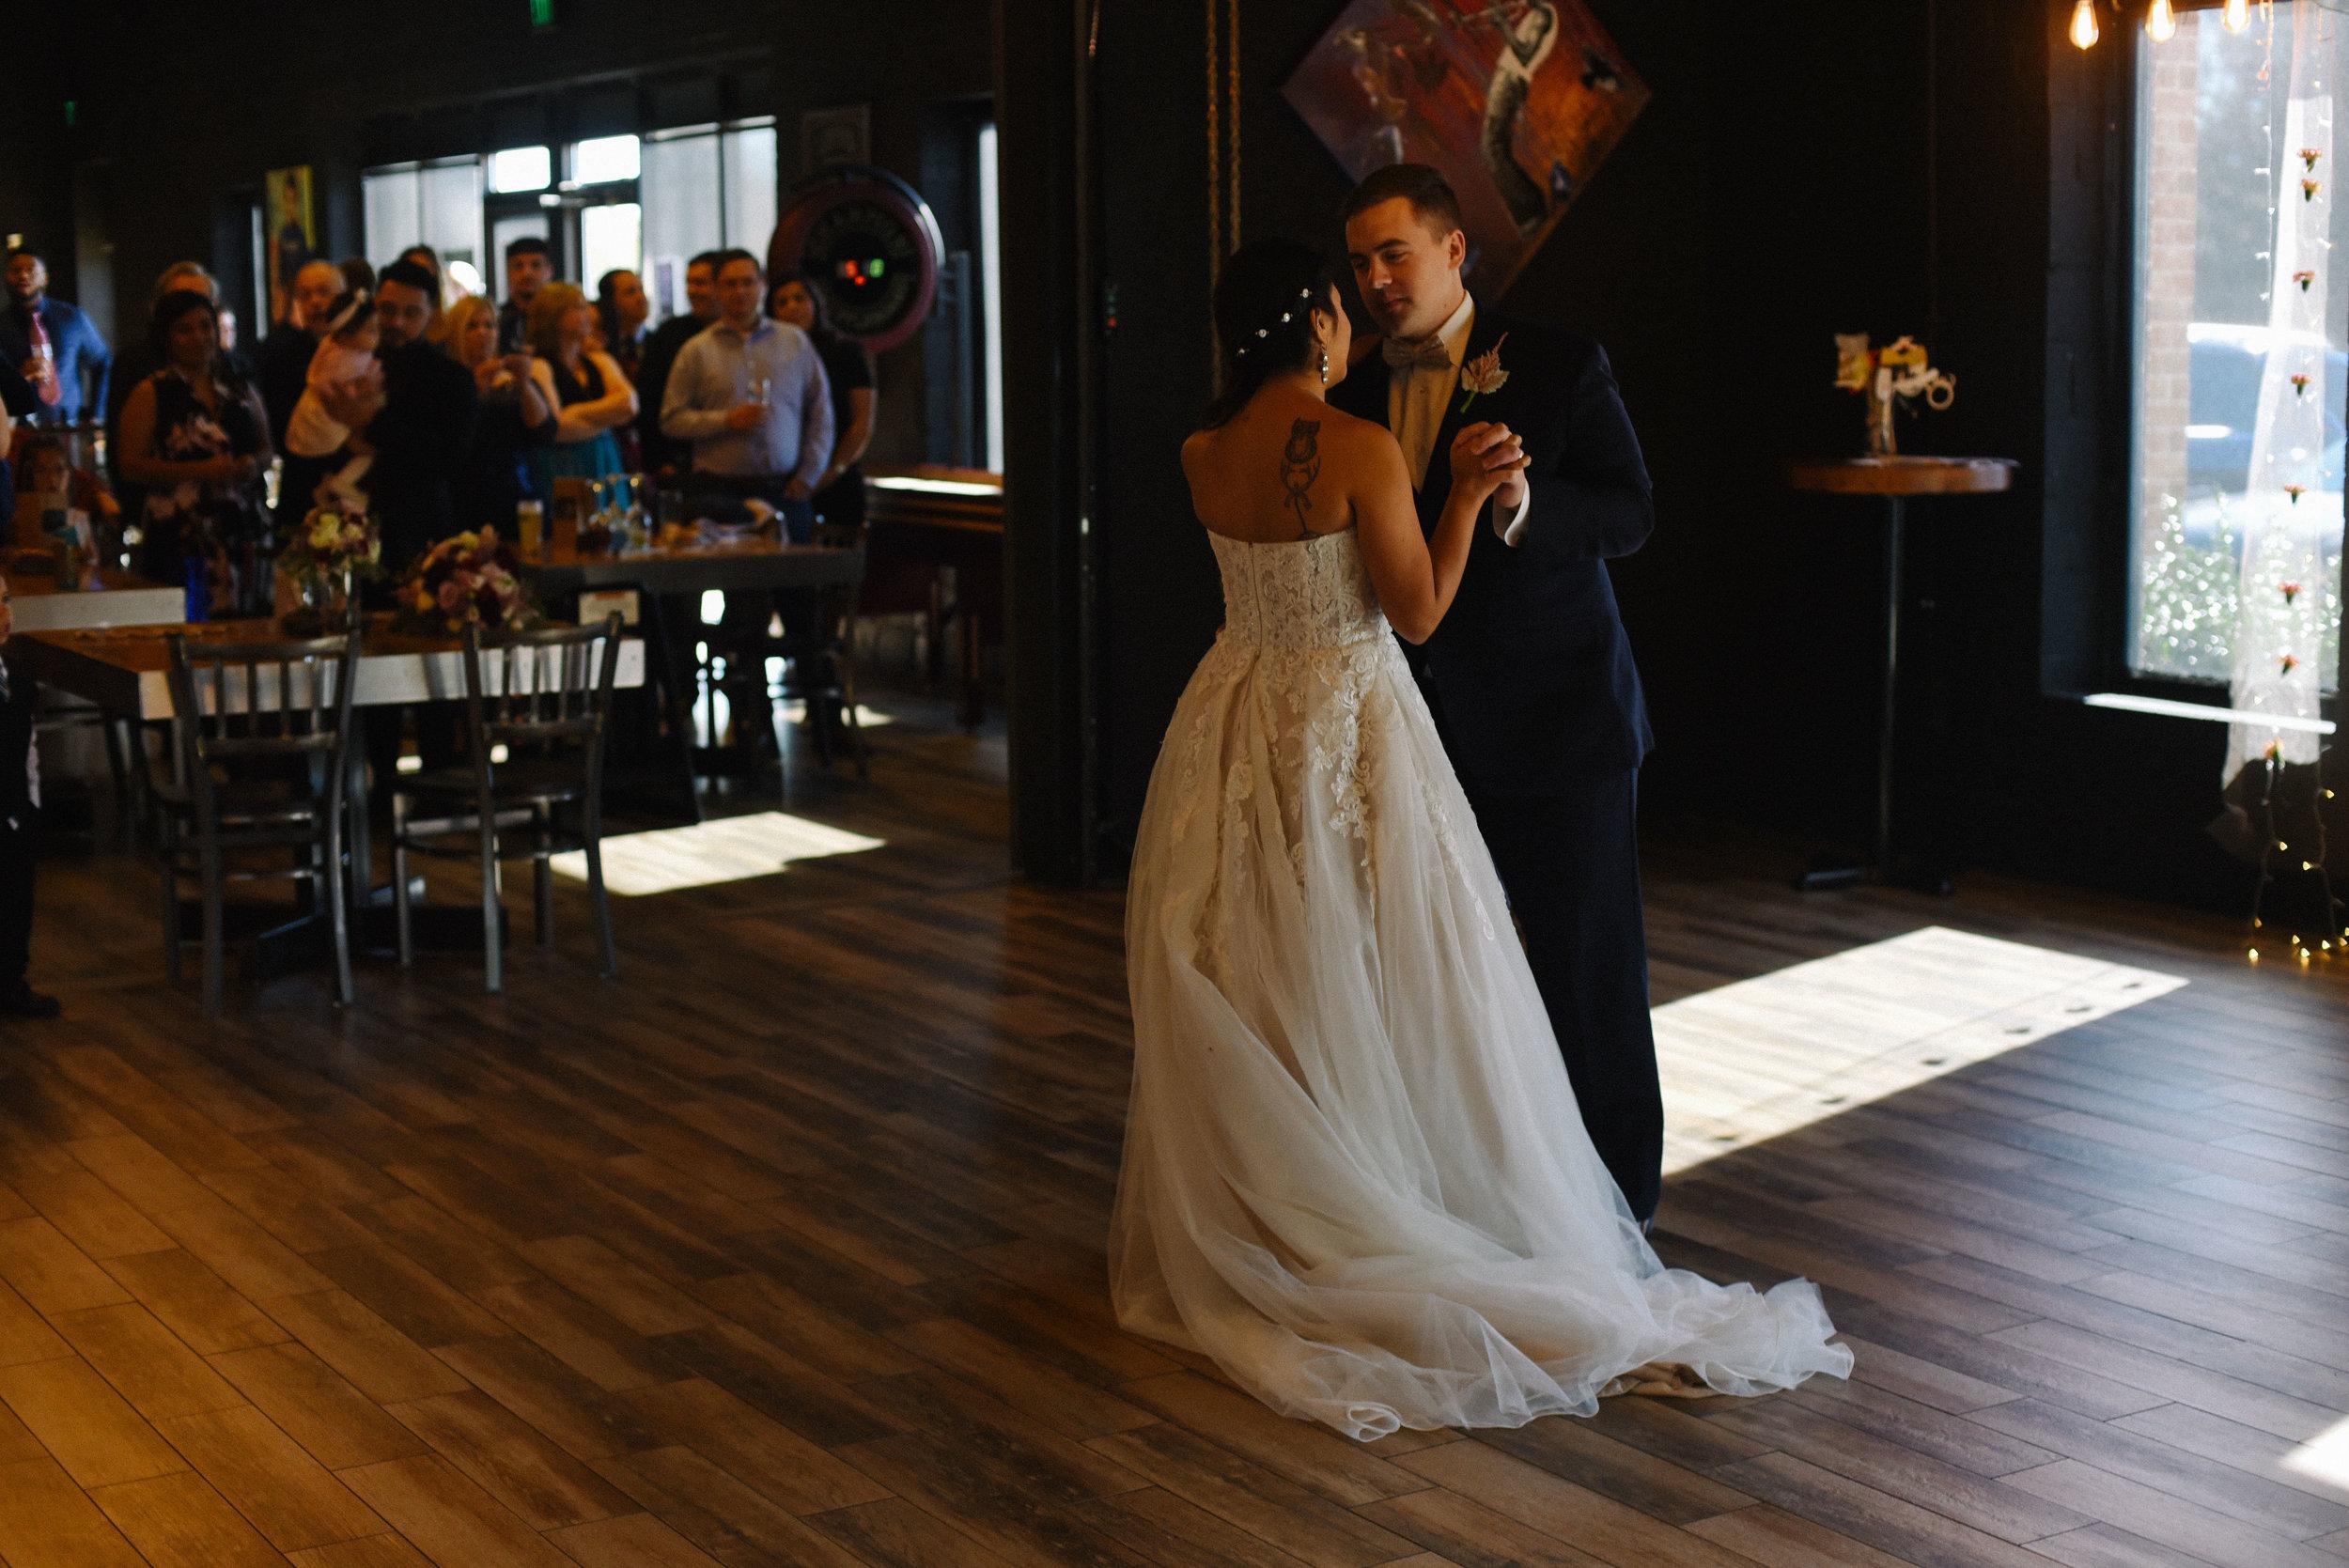 maryland_wedding_photographer_jailbreak_brewing_company-46.jpg